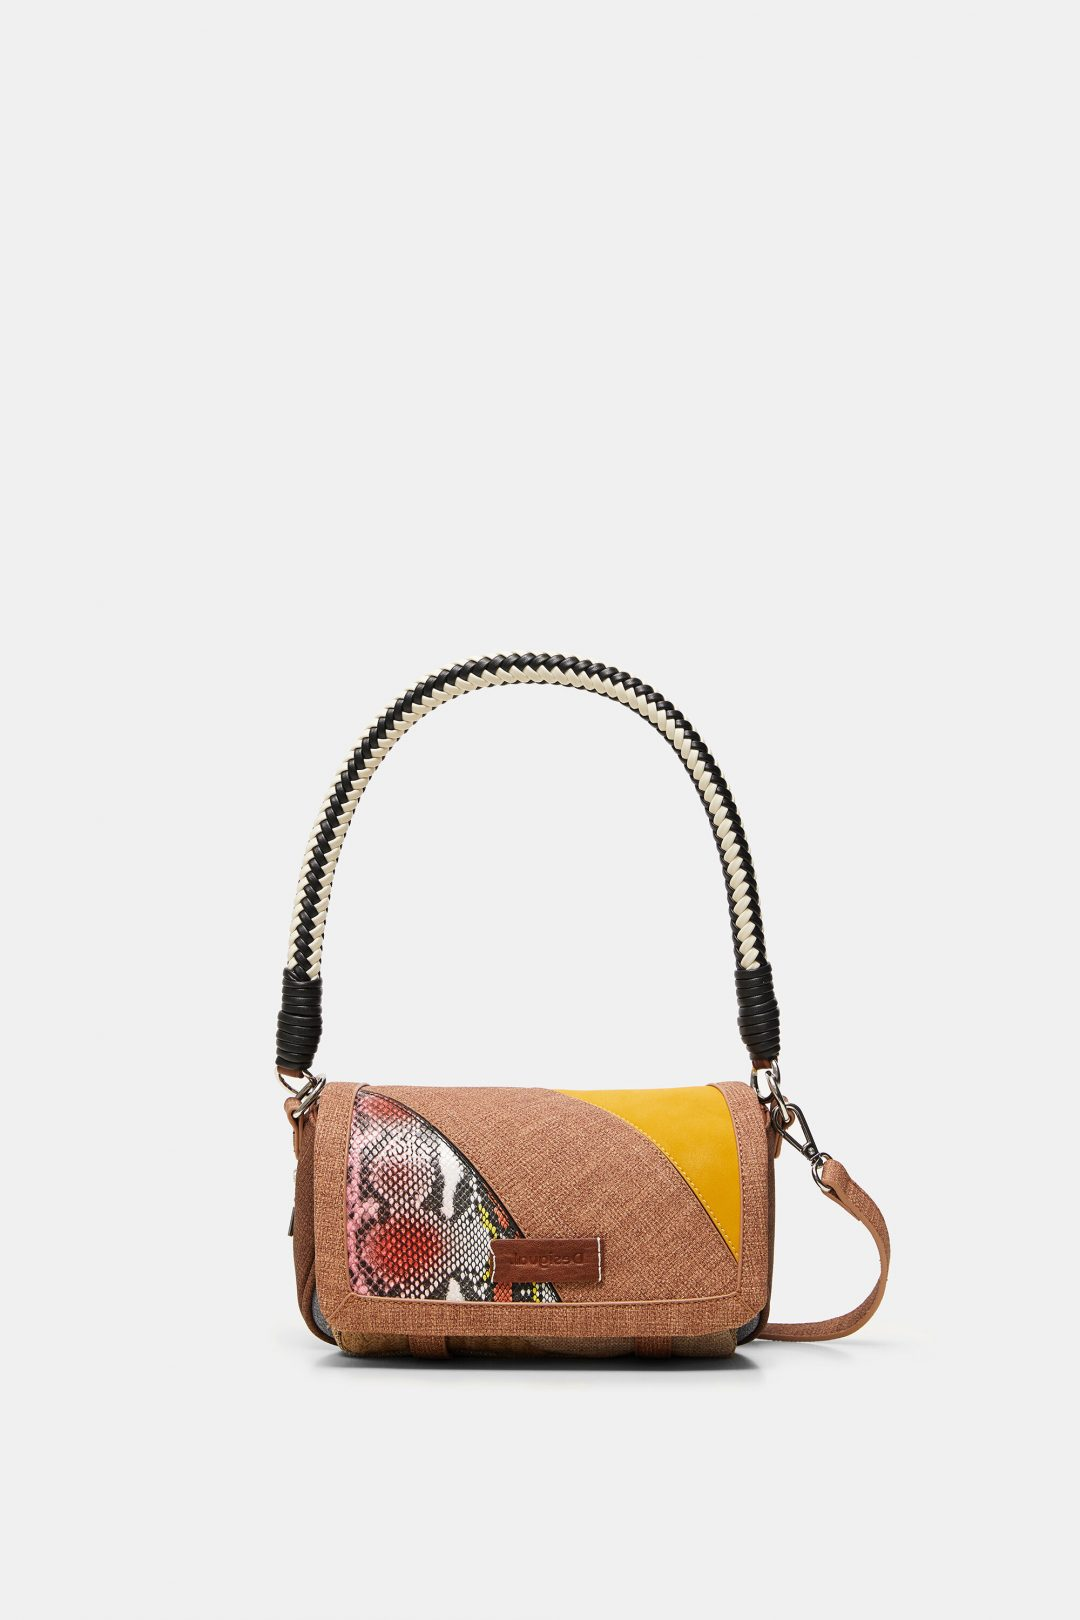 Desigual torba 599kn, Vikend+ cijena 479.20kn